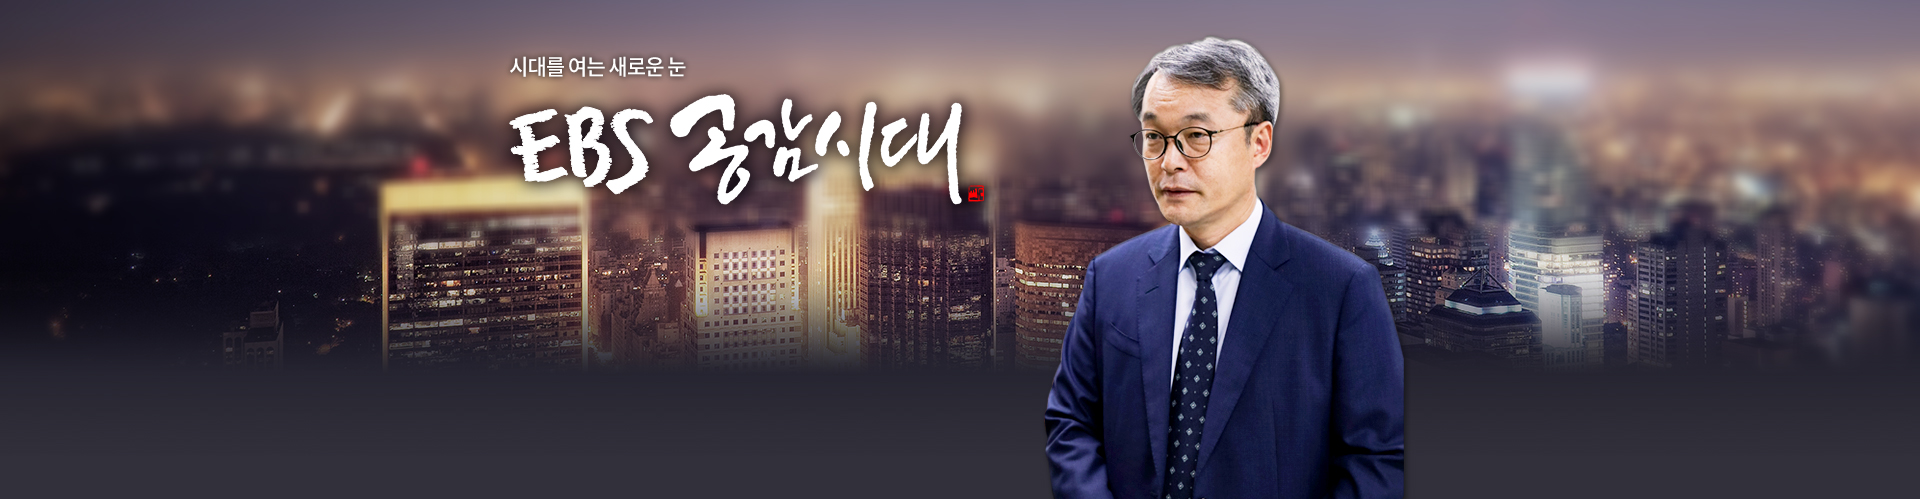 EBS 공감시대 - 0523(목) 공감시대